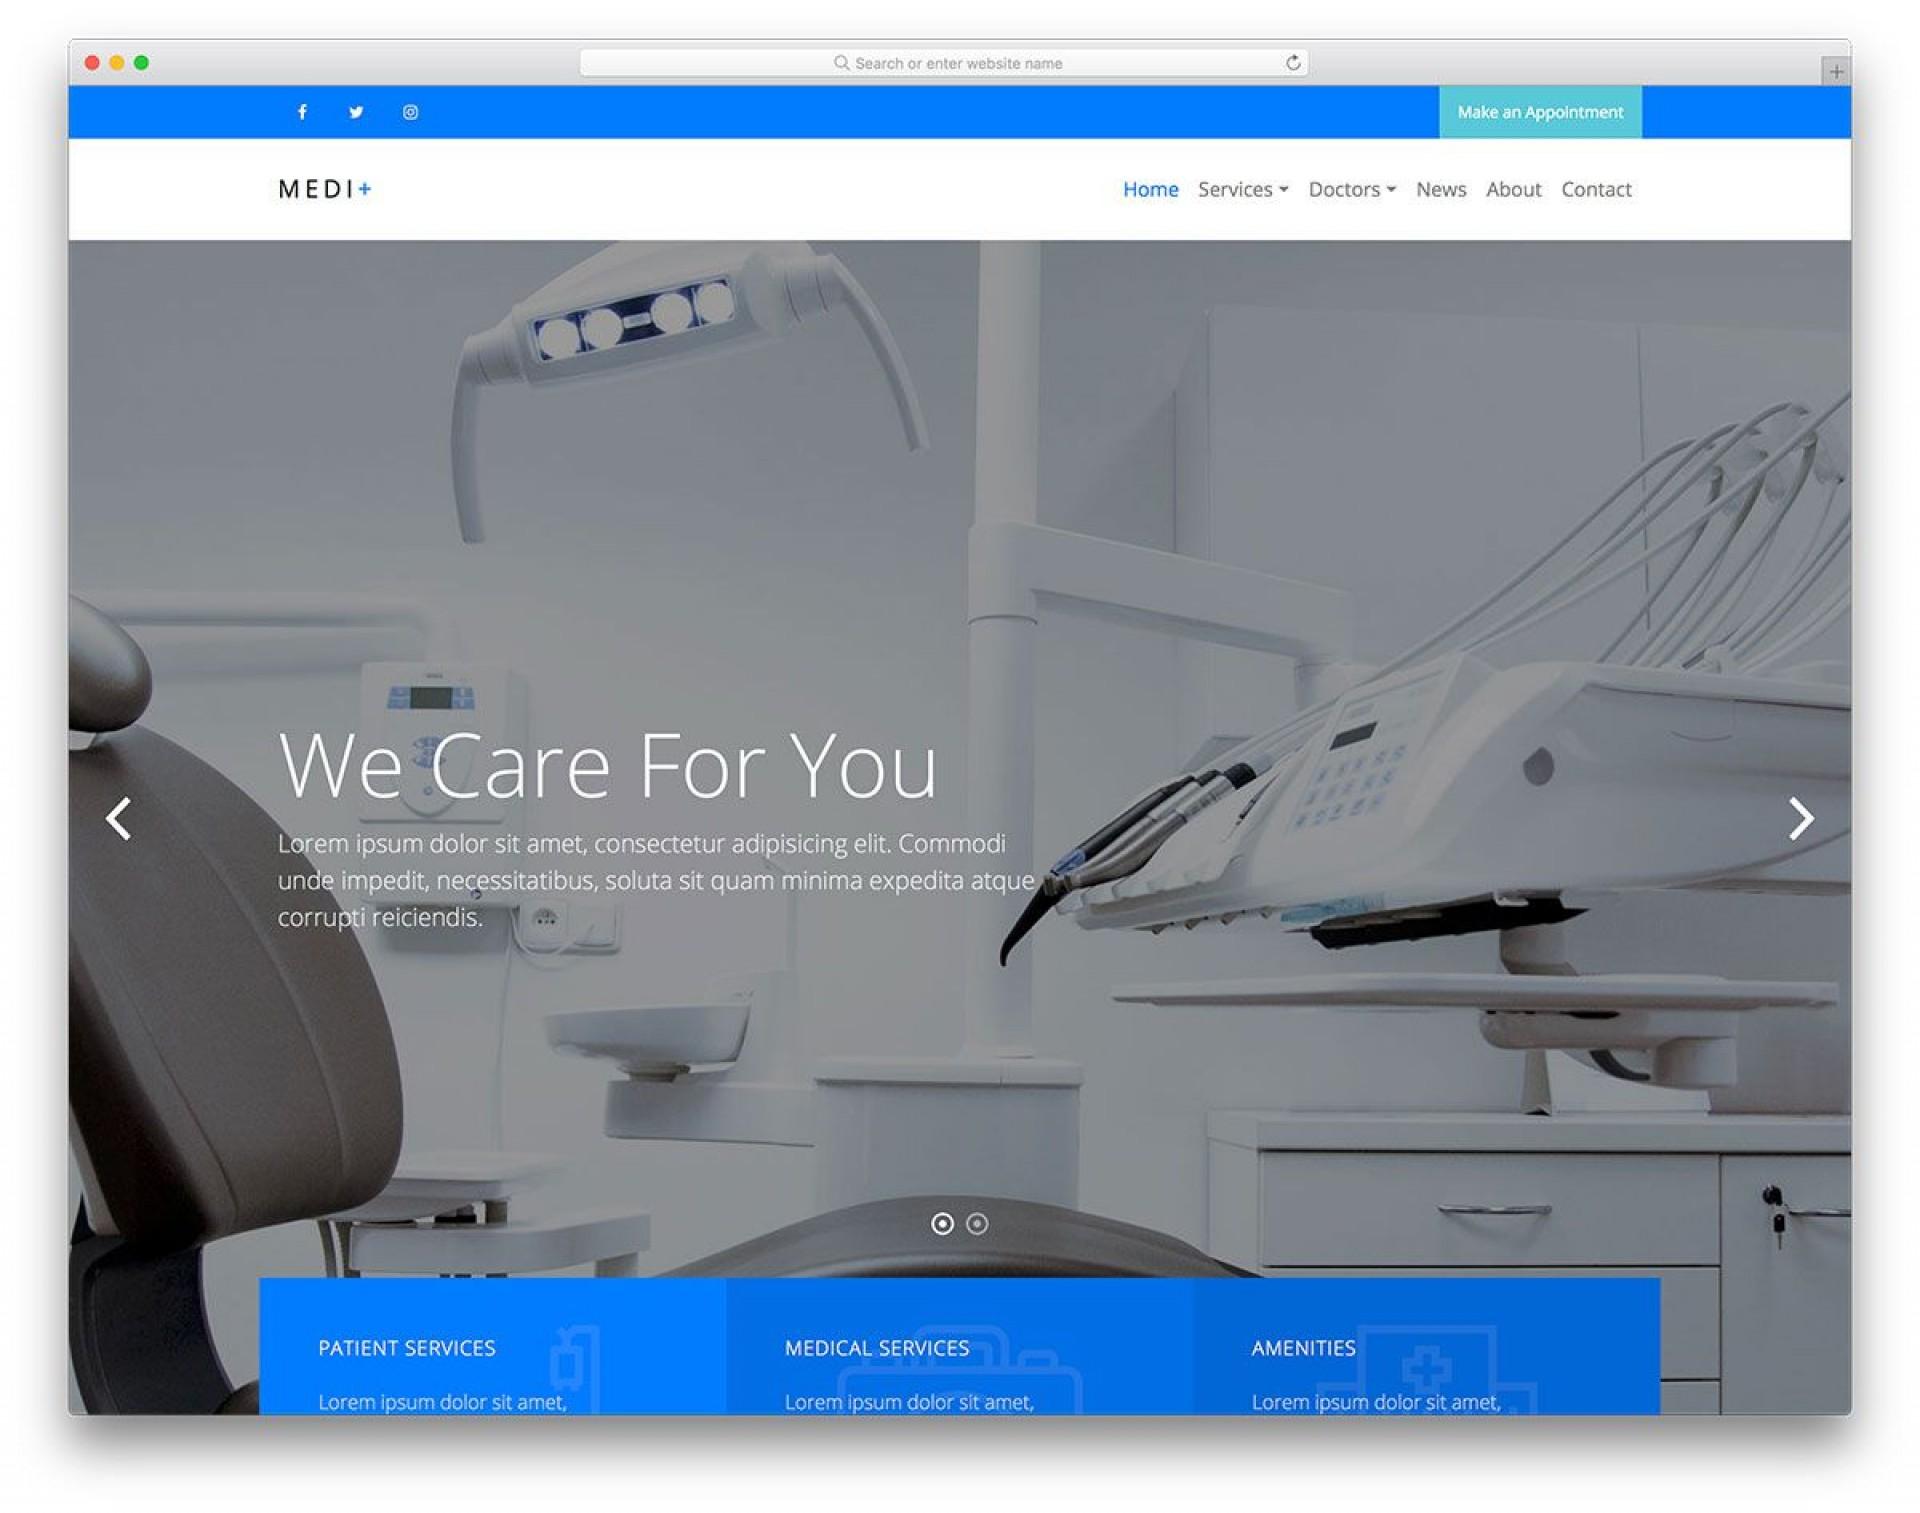 007 Wonderful Mobile Friendly Website Template High Definition  Best1920